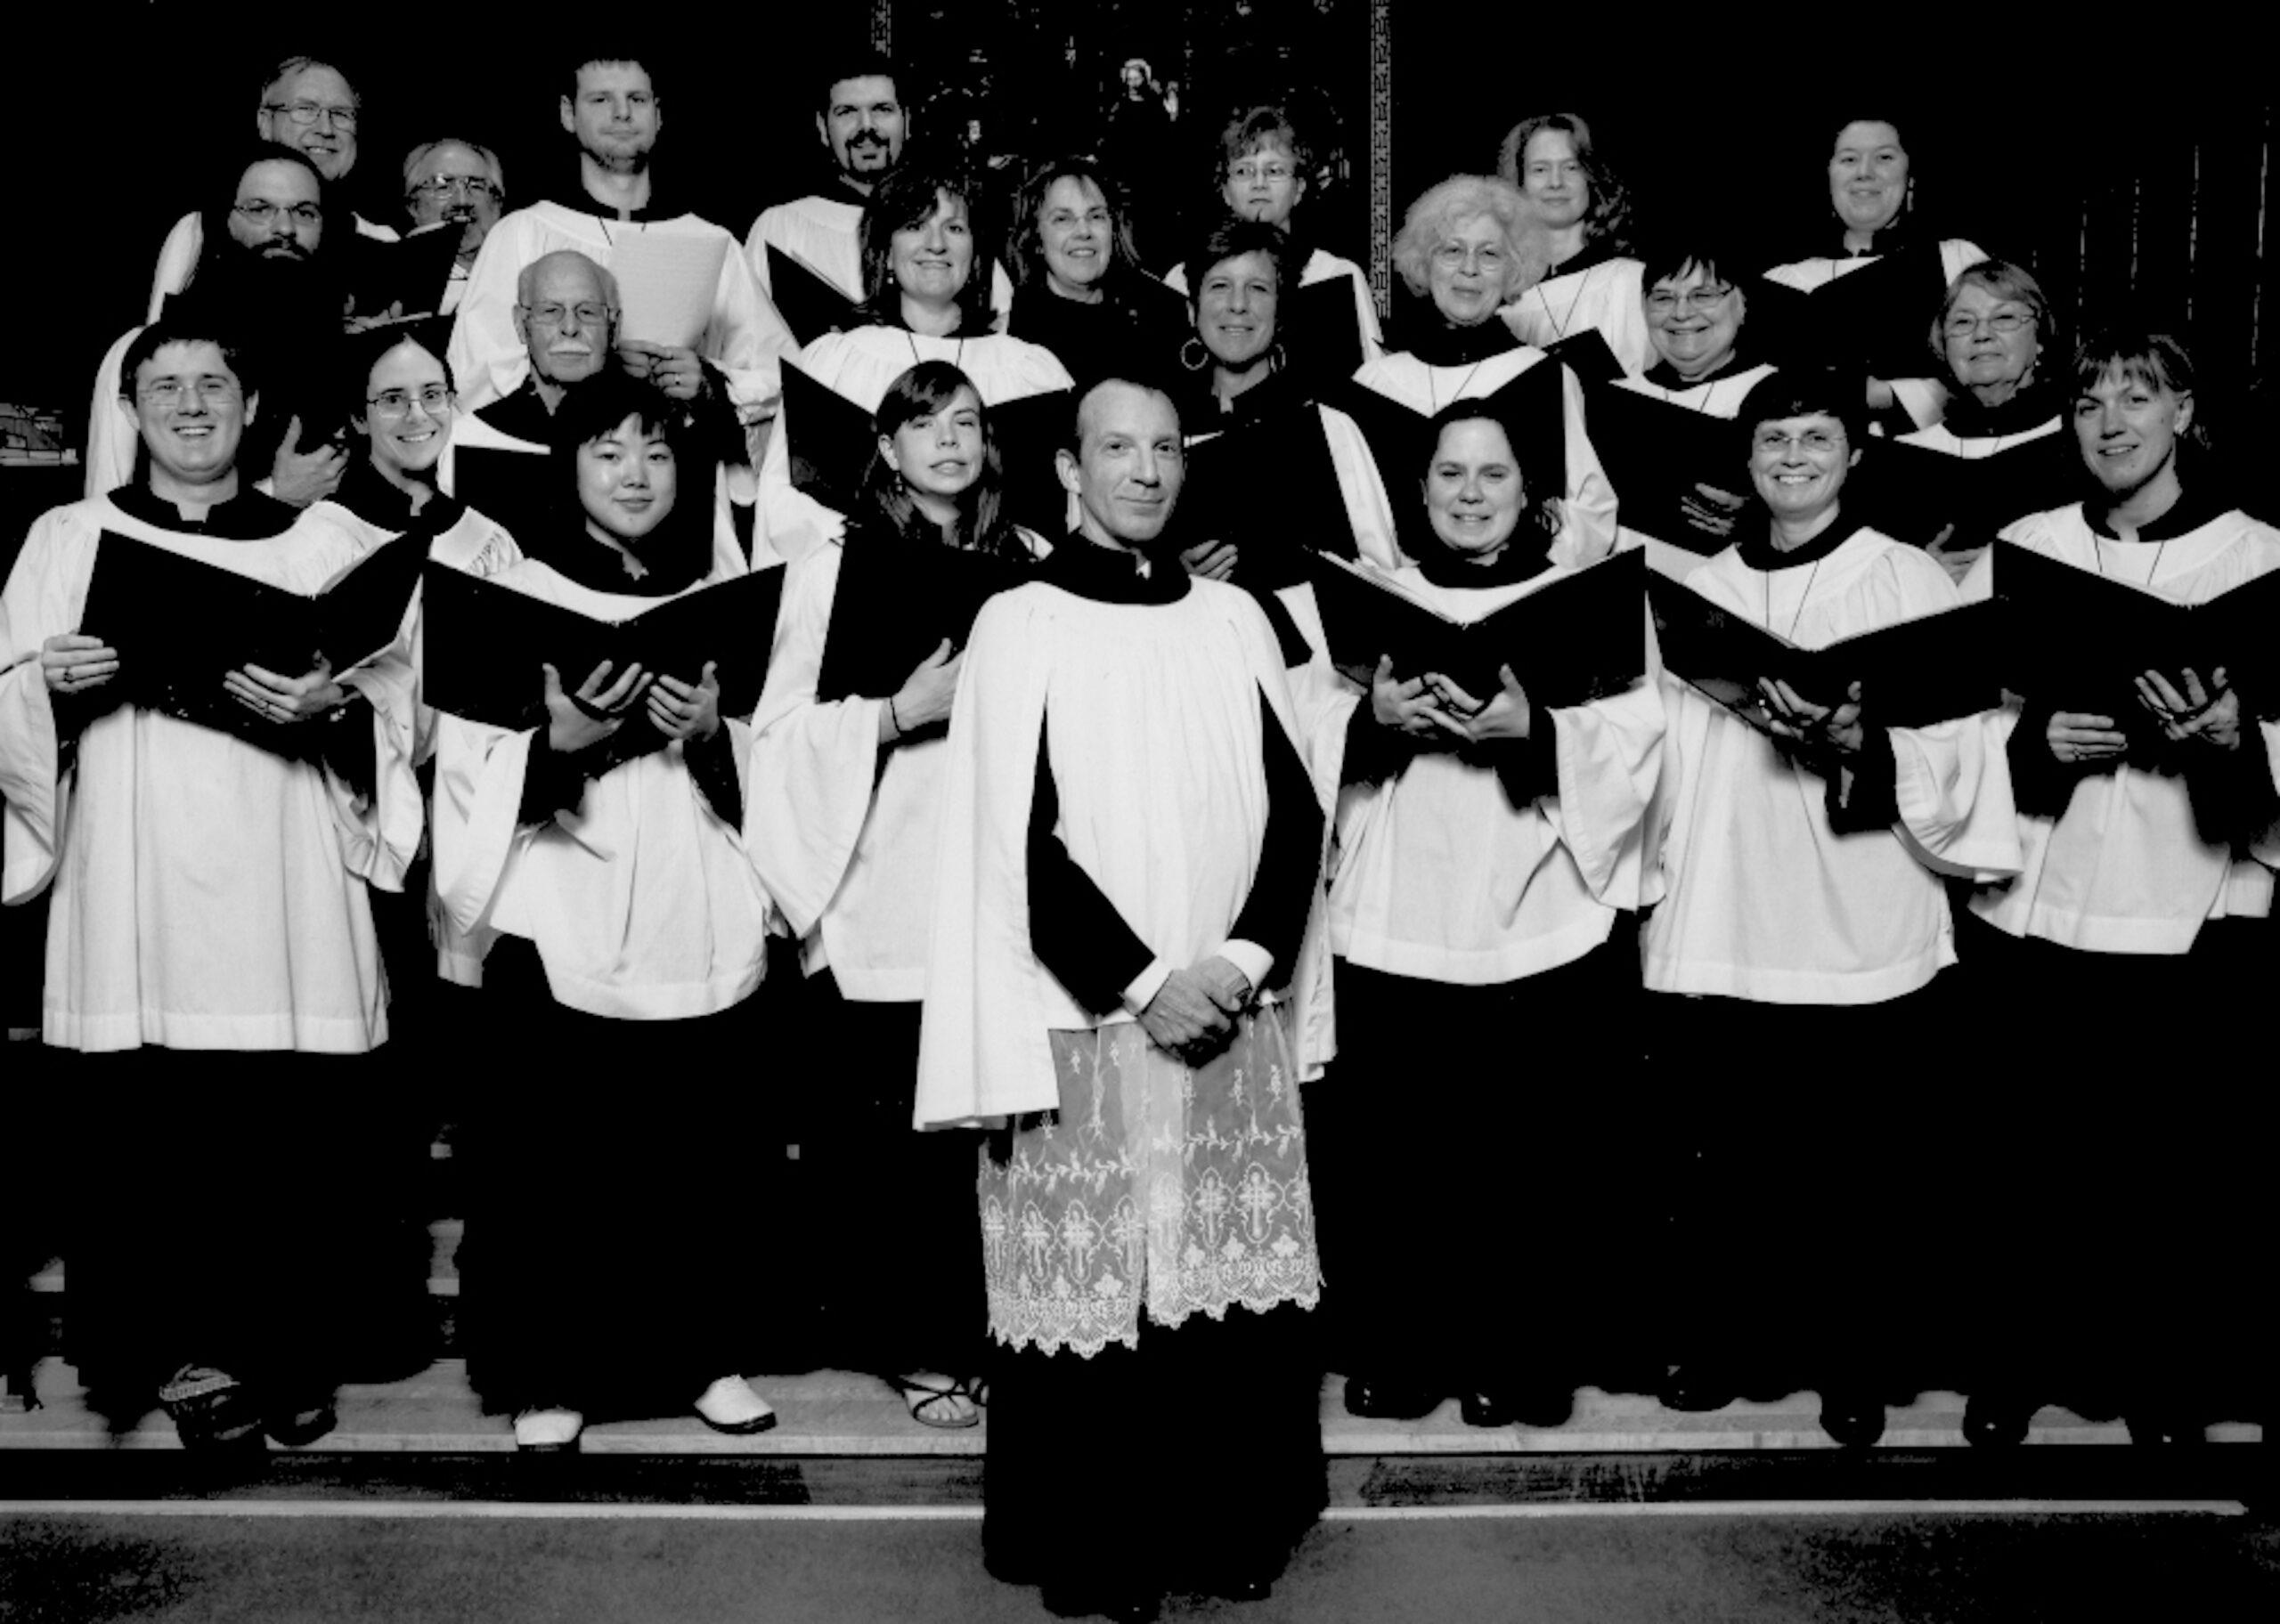 Members of the Parish Choir of St. Matthew's Episcopal Church